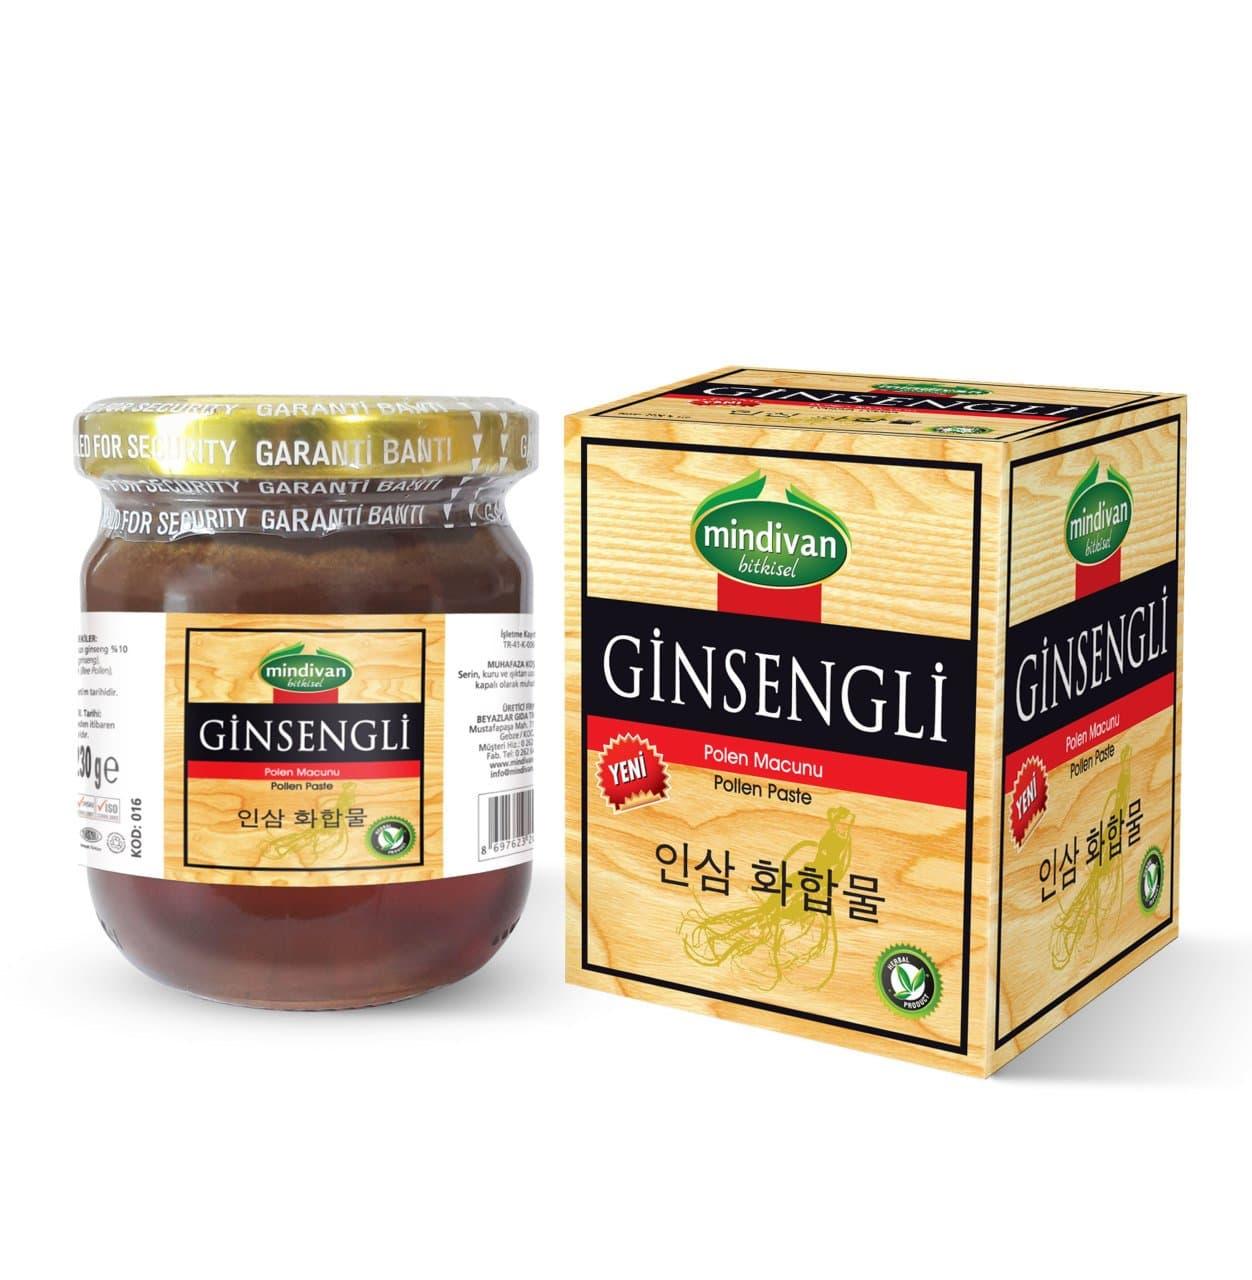 Mindivan Ginseng Polenli Macun 230 gr ürünü